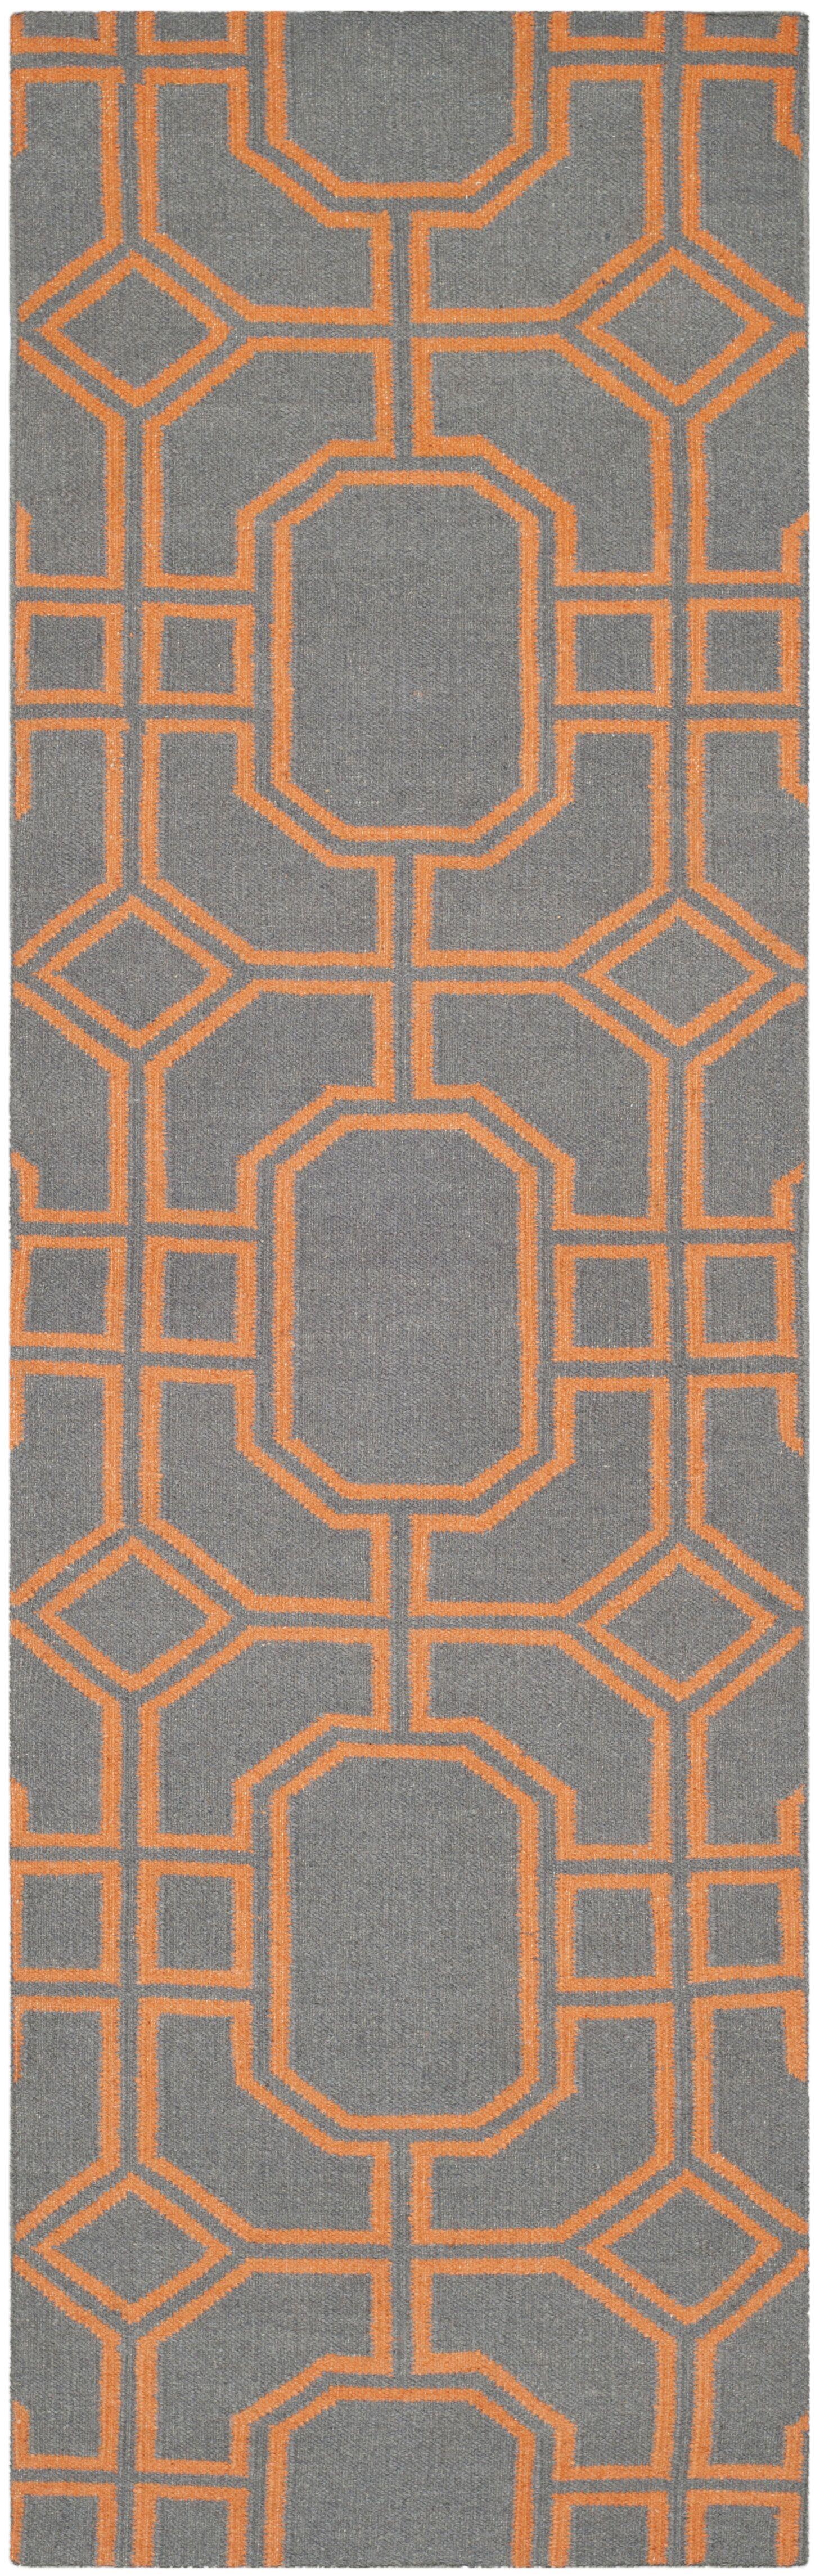 Dhurries Hand-Woven Wool Gray/Orange Area Rug Rug Size: Runner 2'6